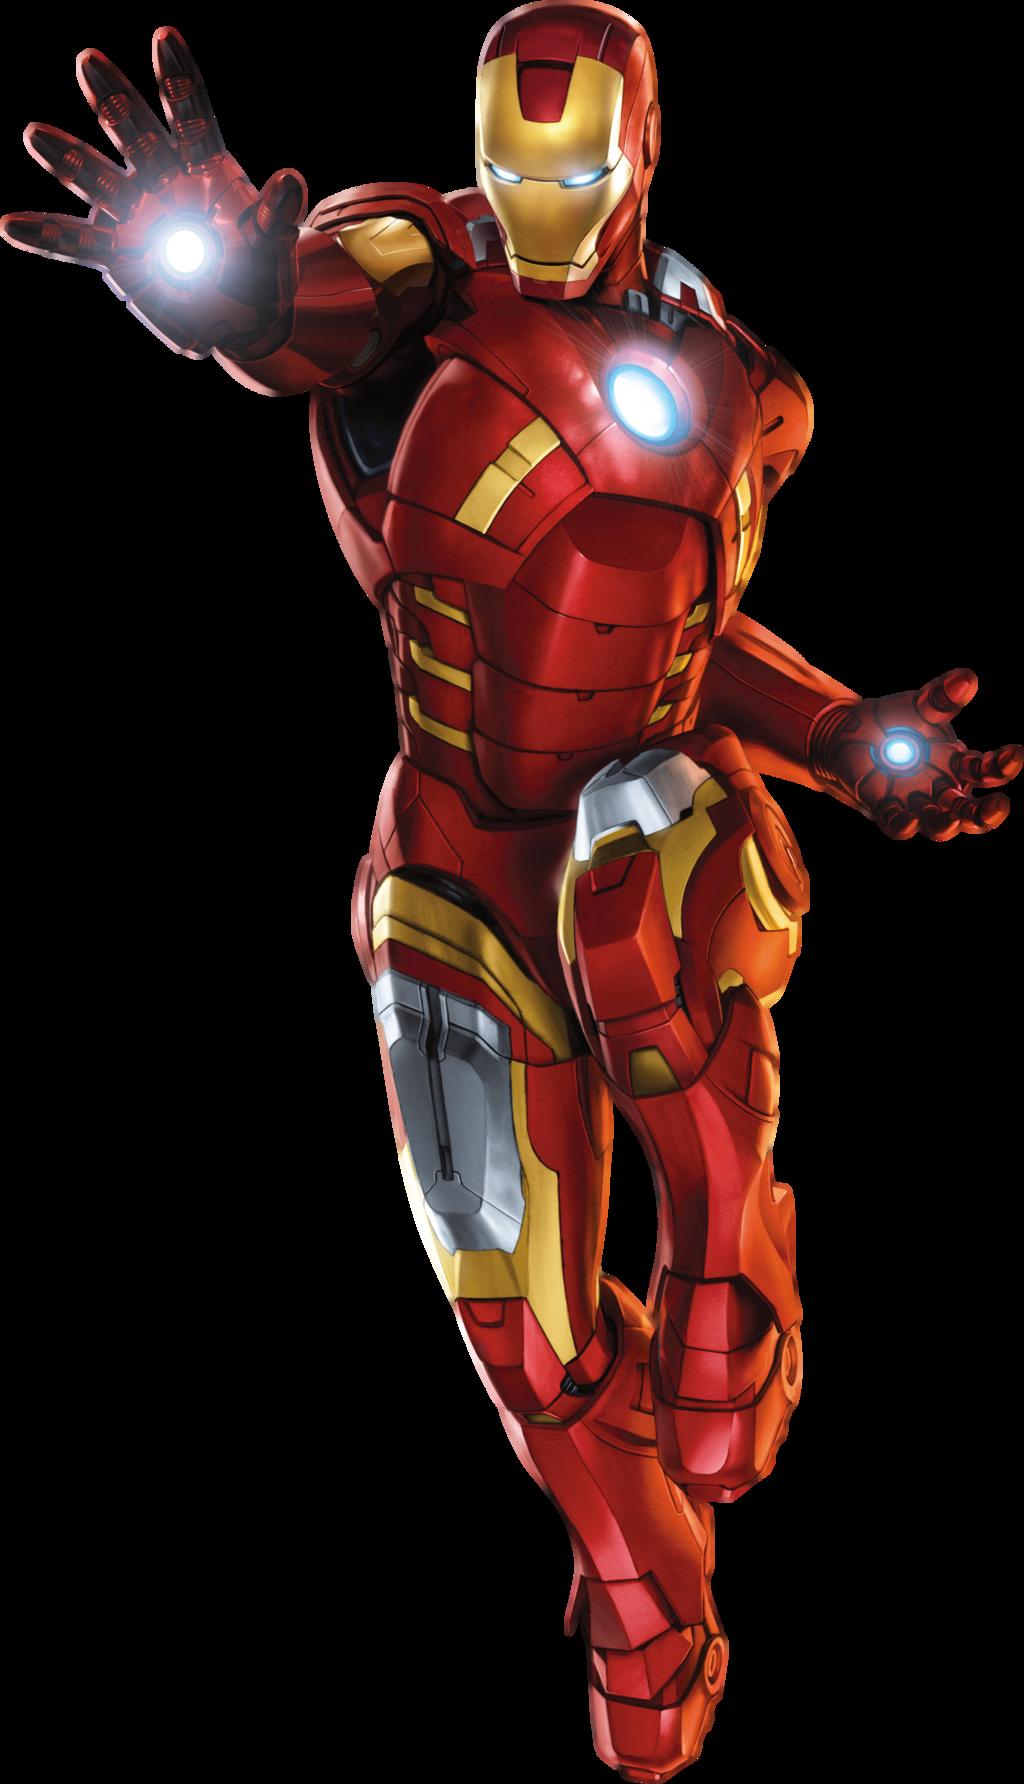 Iron Man clipart-Iron Man clipart-6